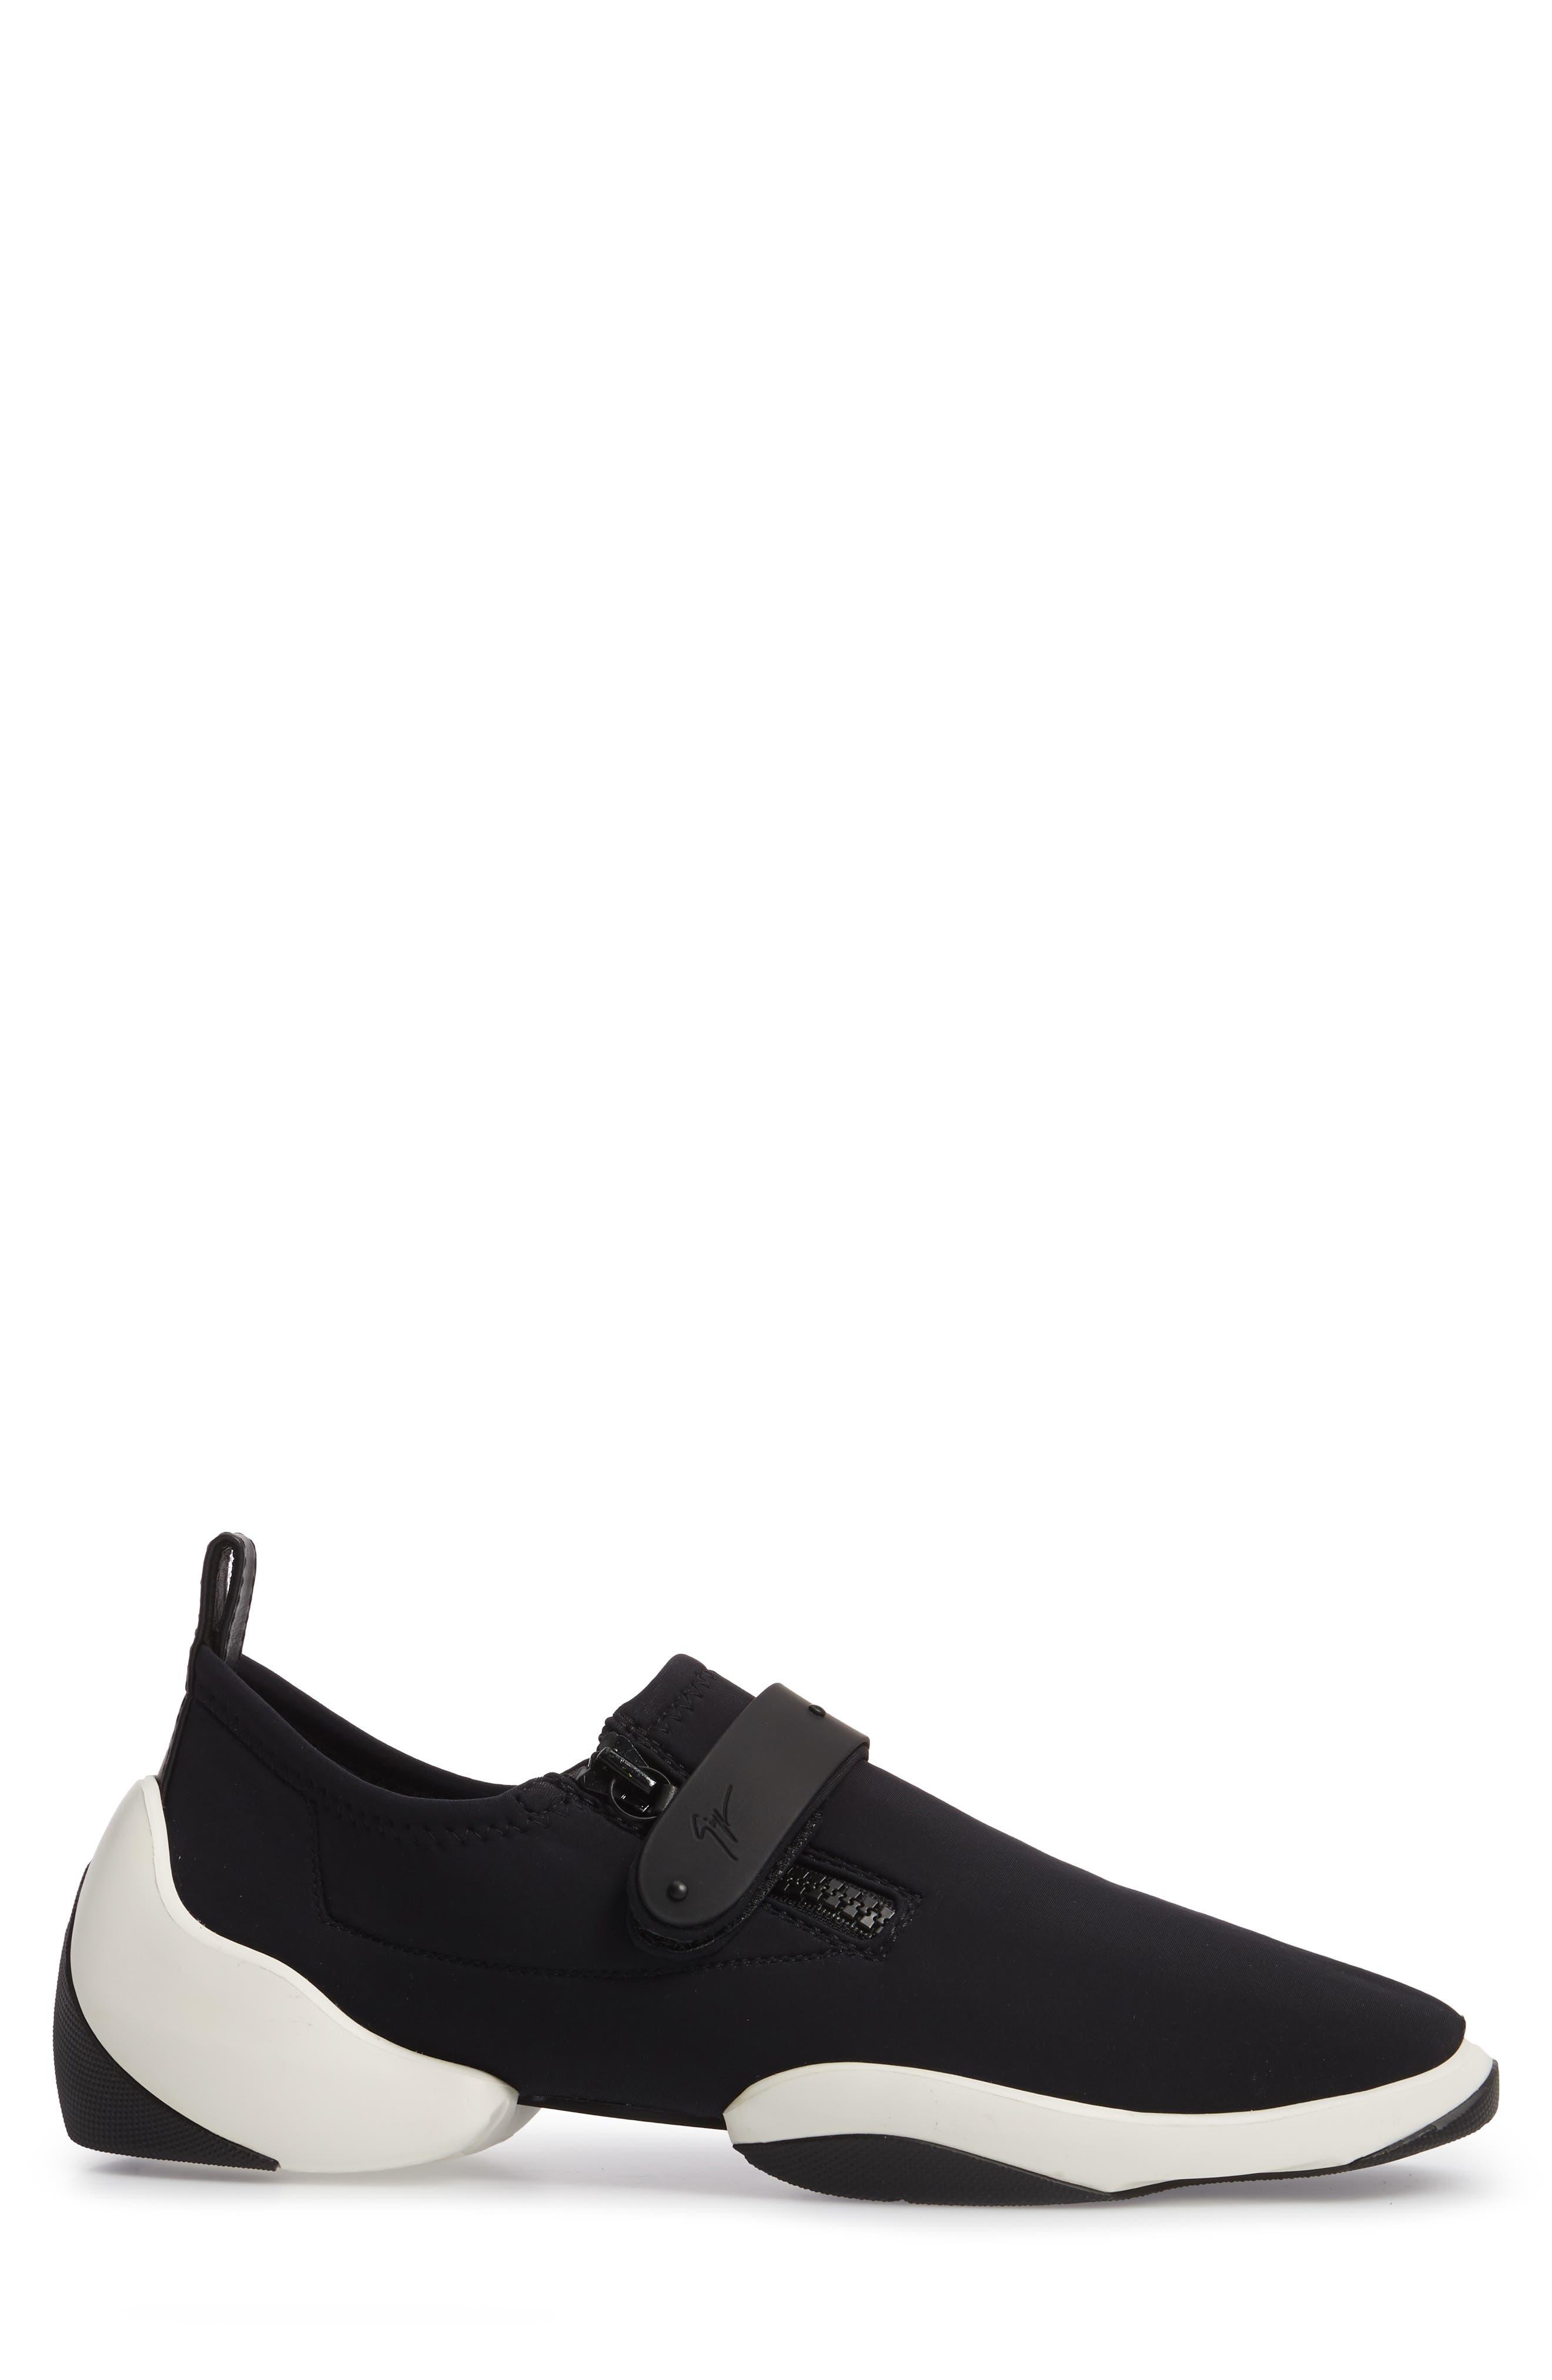 Scuba Strap Sneaker,                             Alternate thumbnail 3, color,                             001